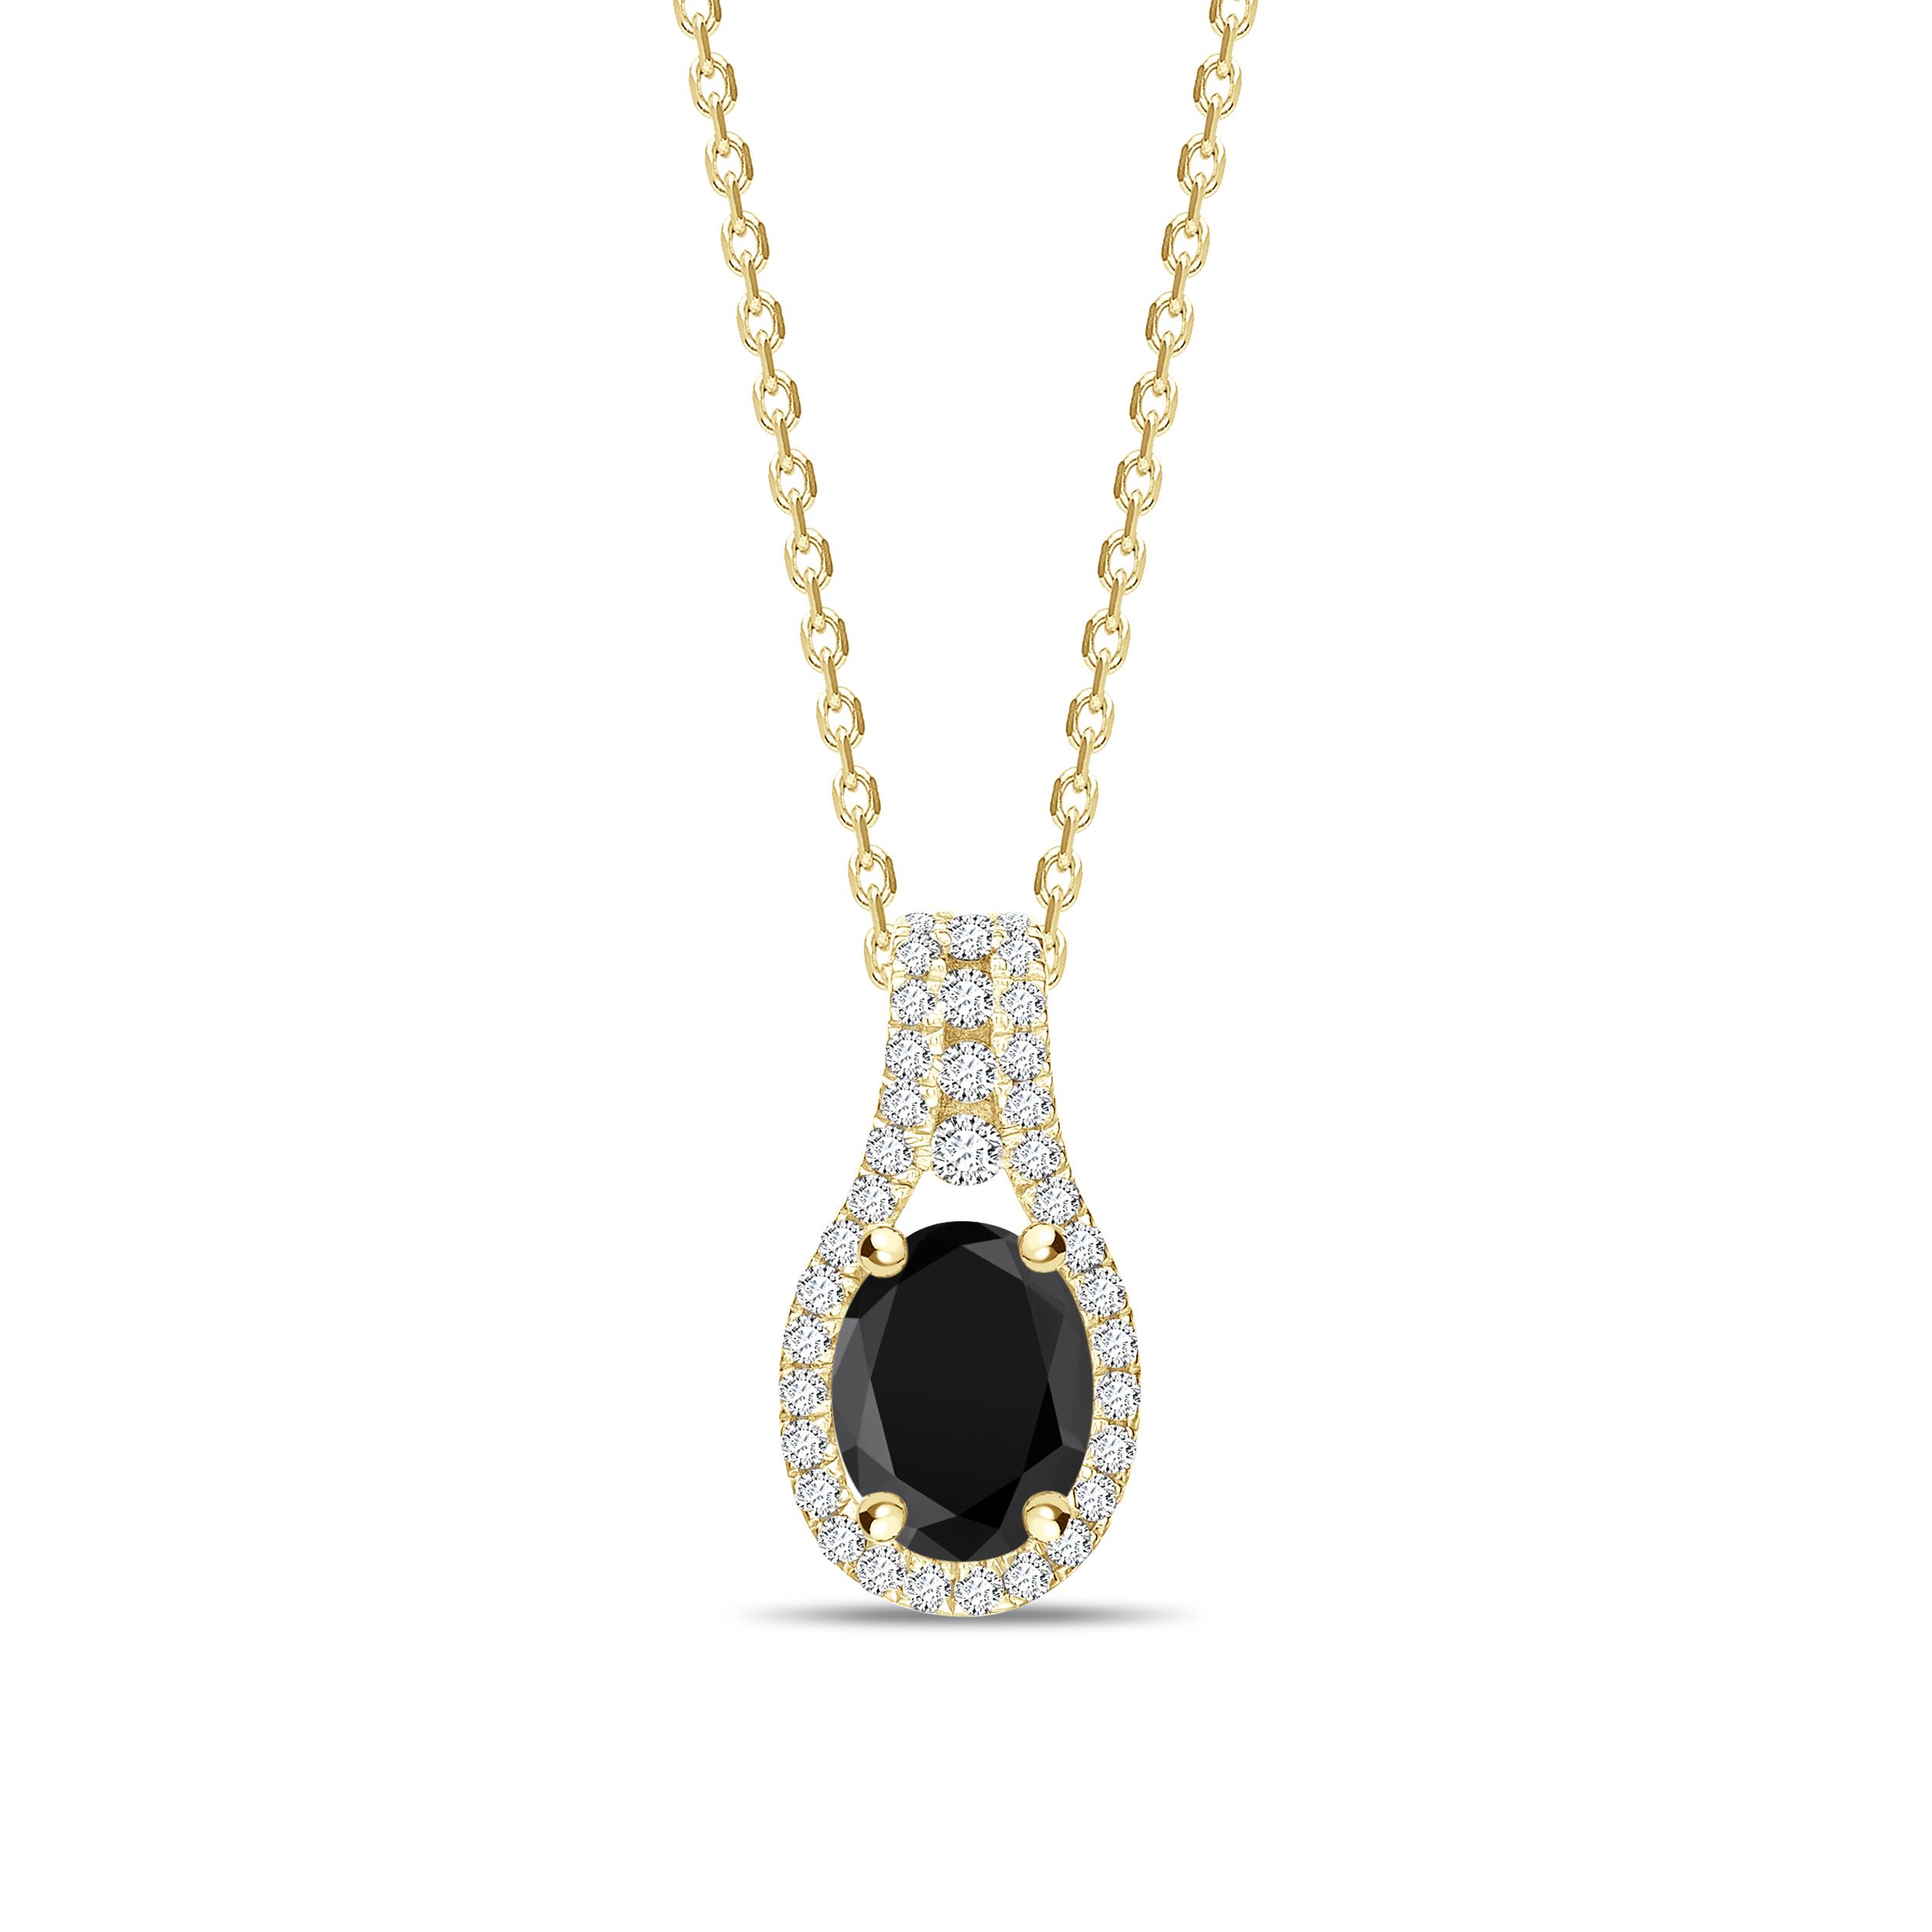 Halo Design Oval Cut Black Diamond Solitaire Pendants Necklace